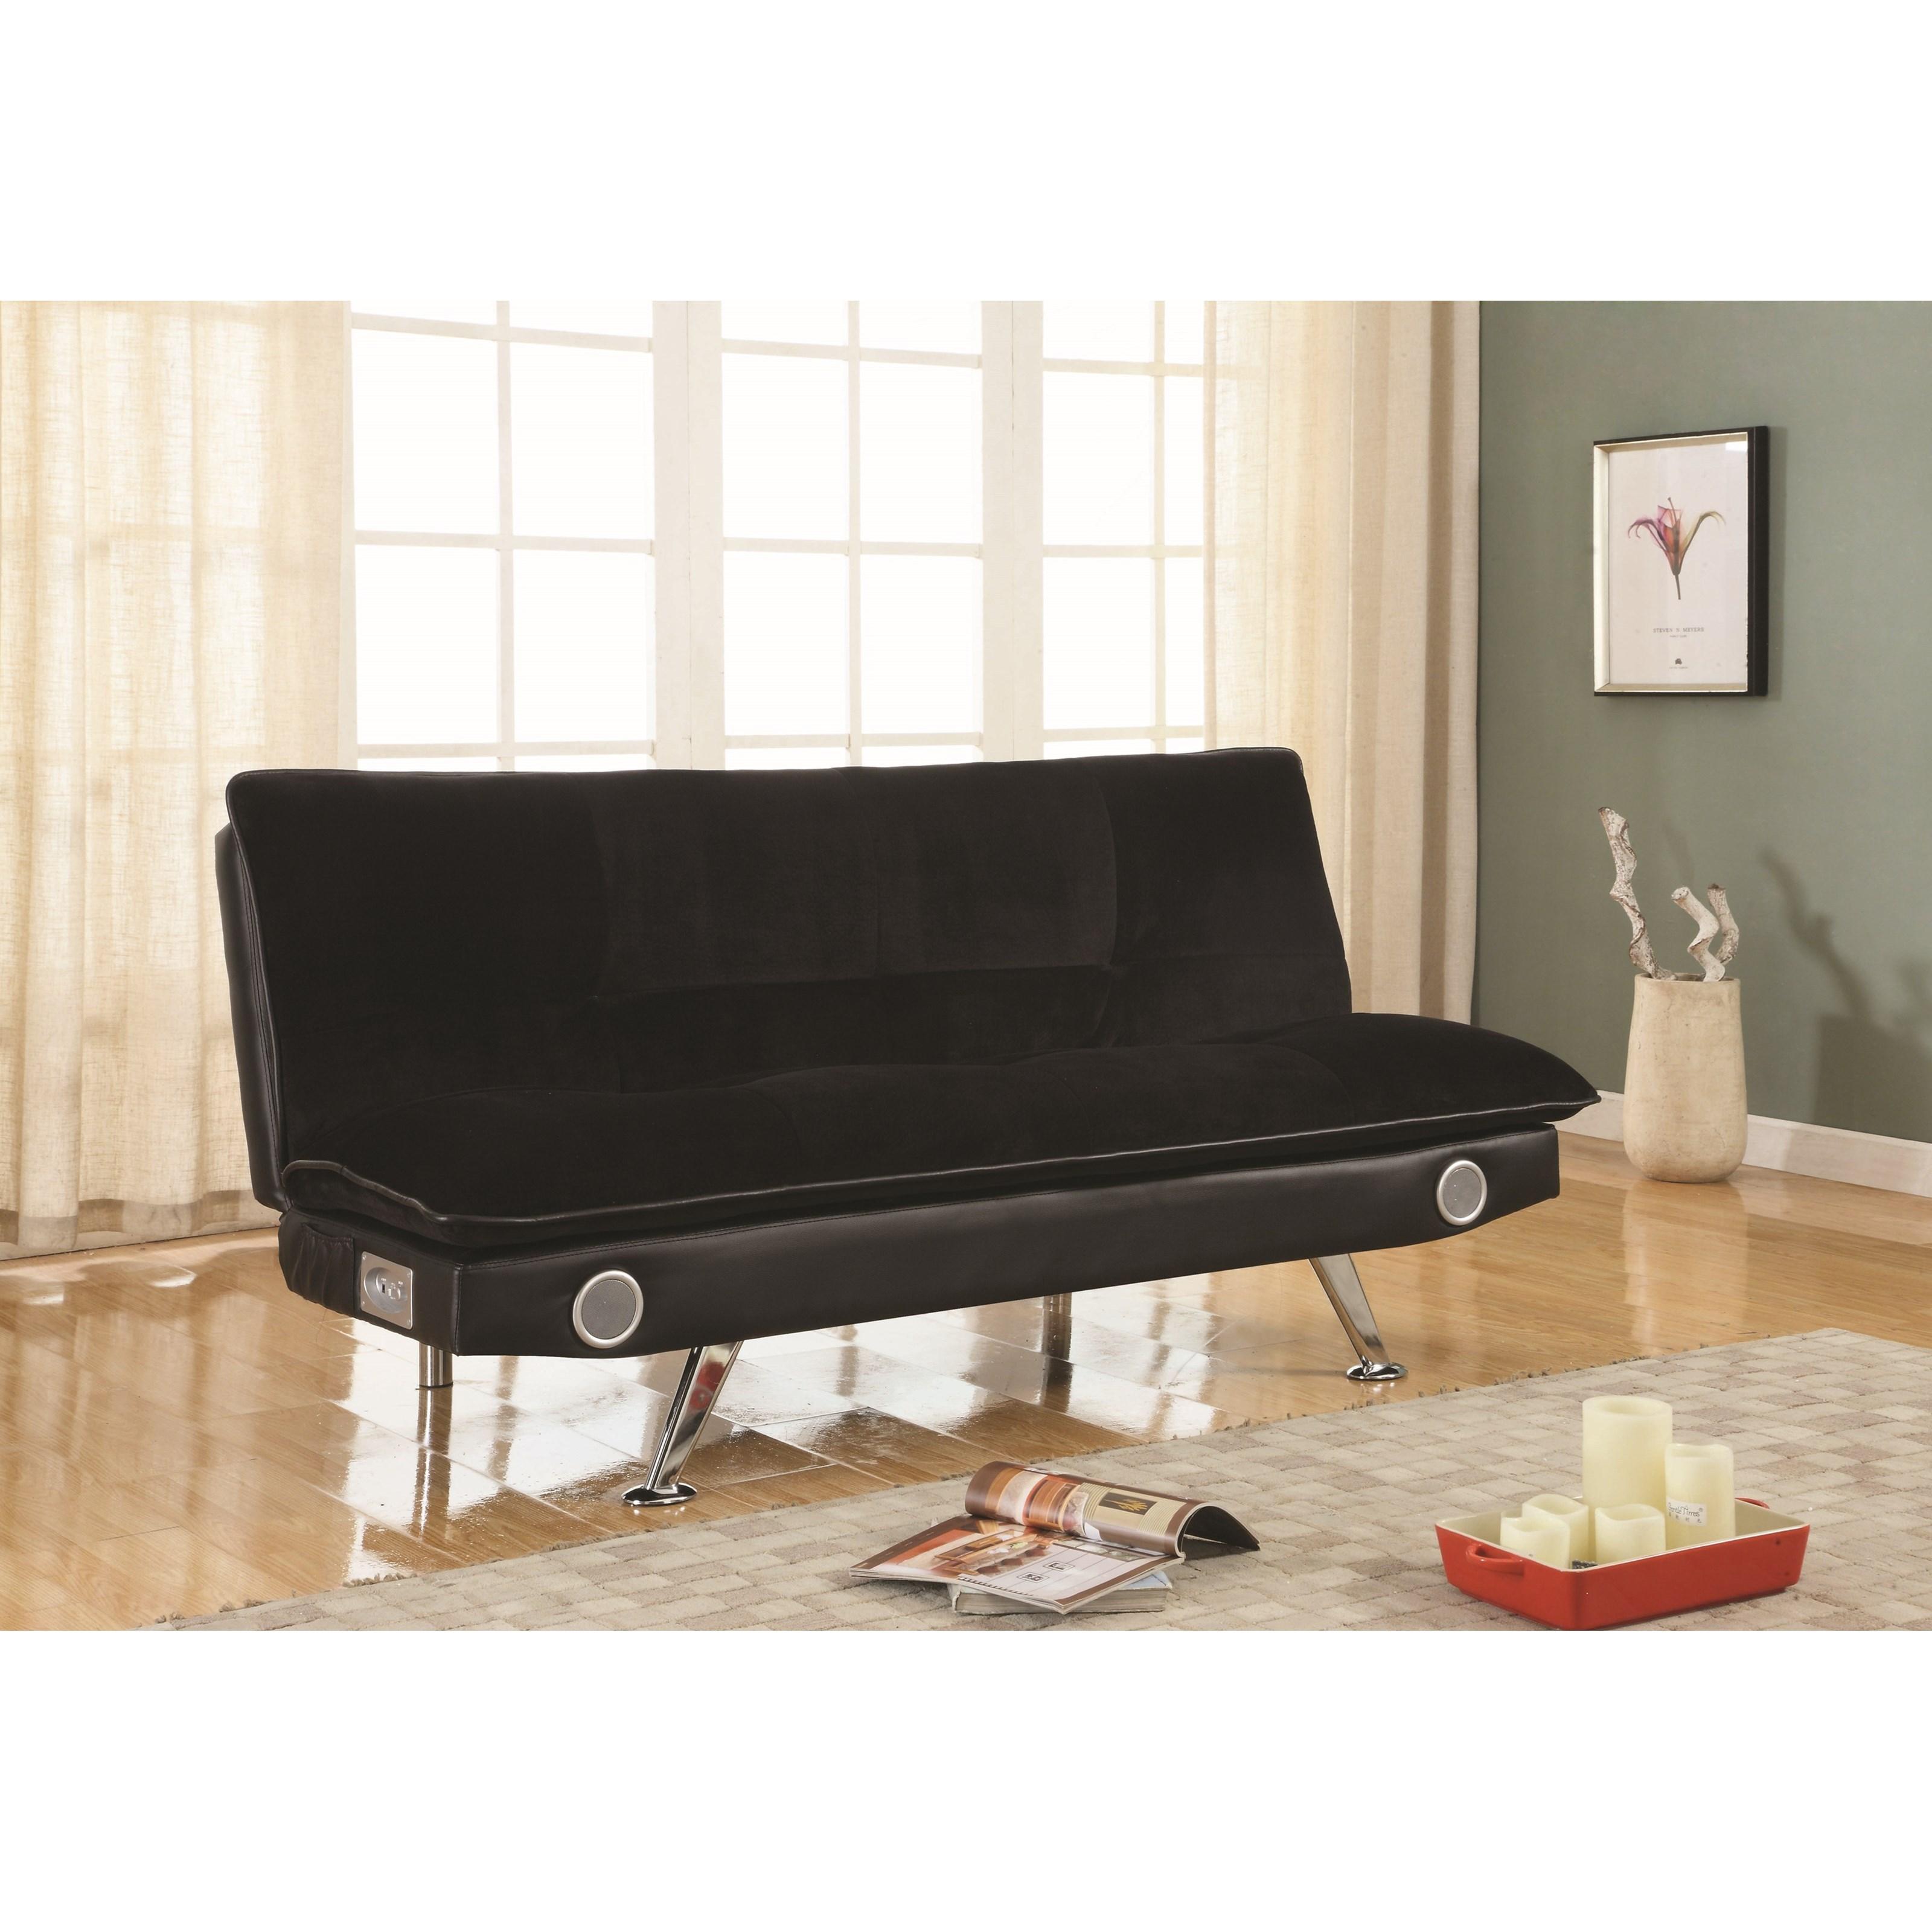 coaster futons 500187 black leatherette sofa bed with. Black Bedroom Furniture Sets. Home Design Ideas